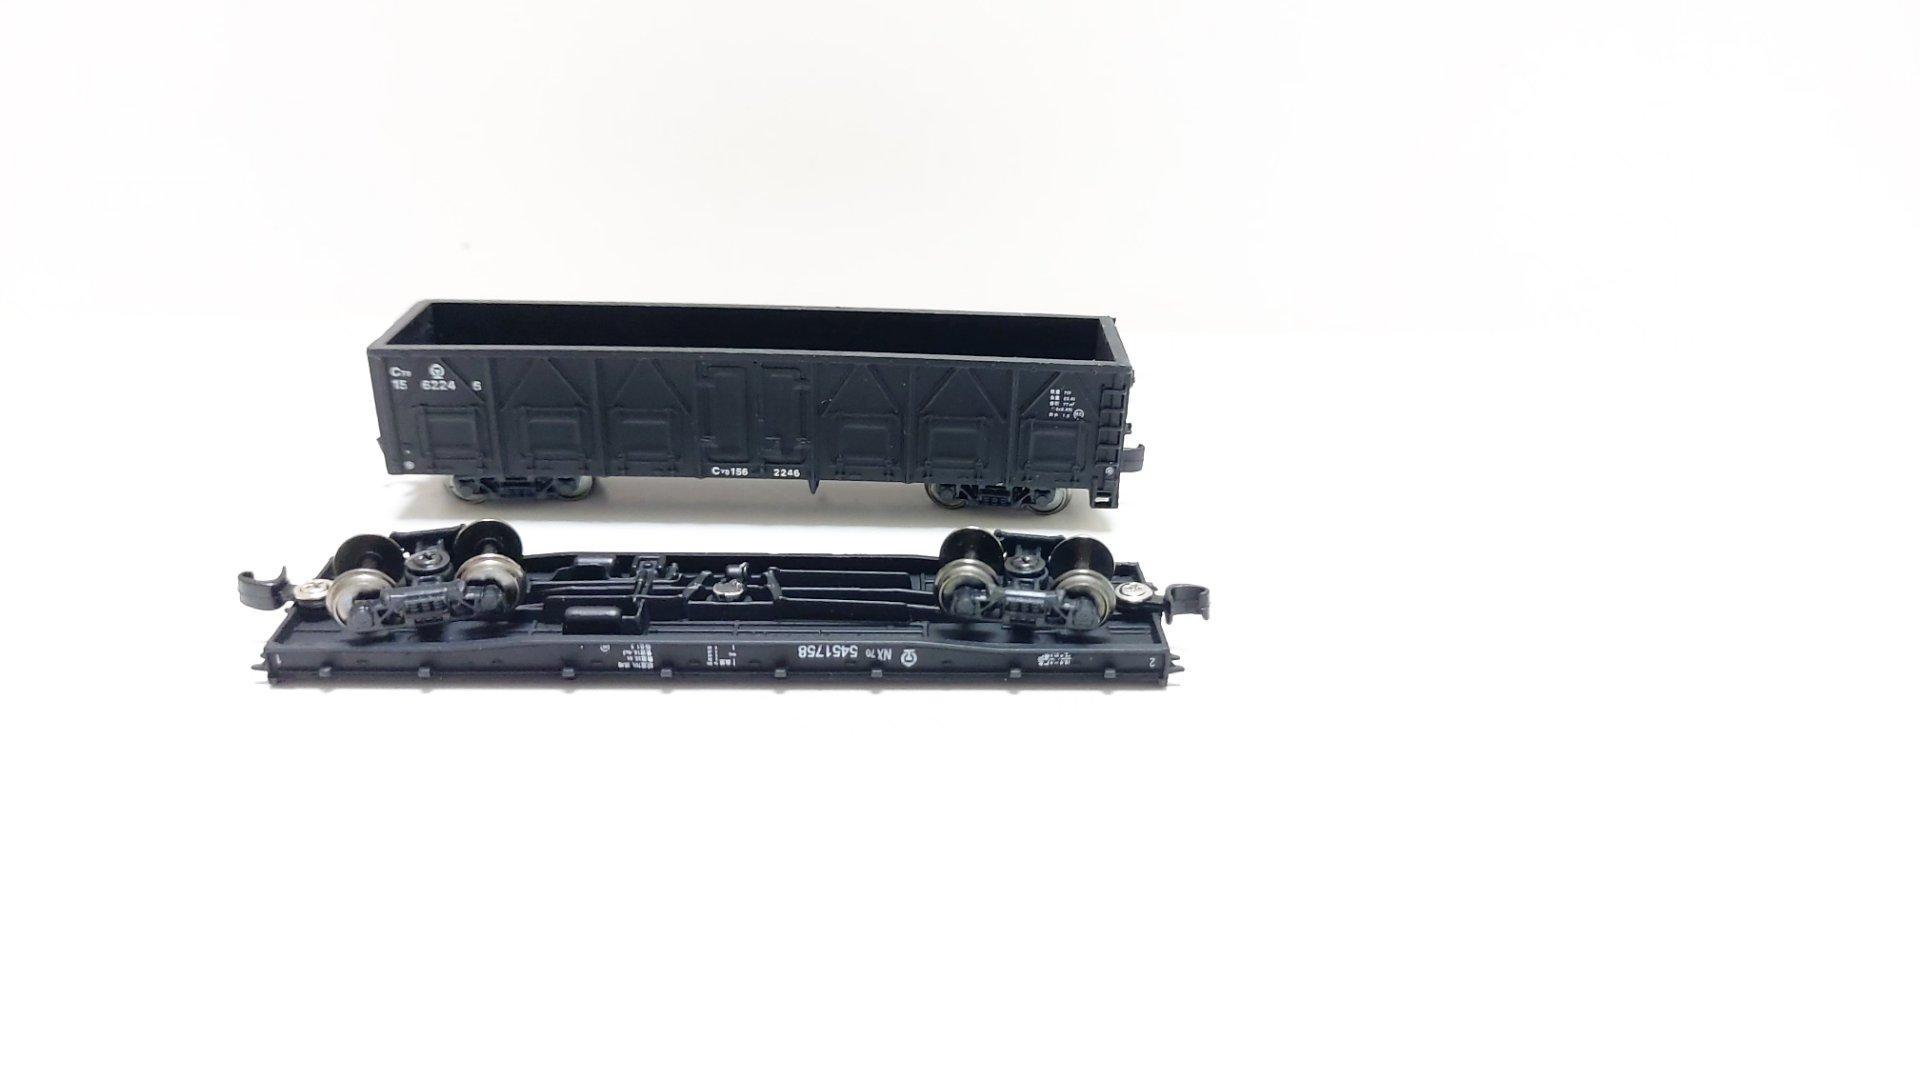 A miniature replica of a railway carriage 3